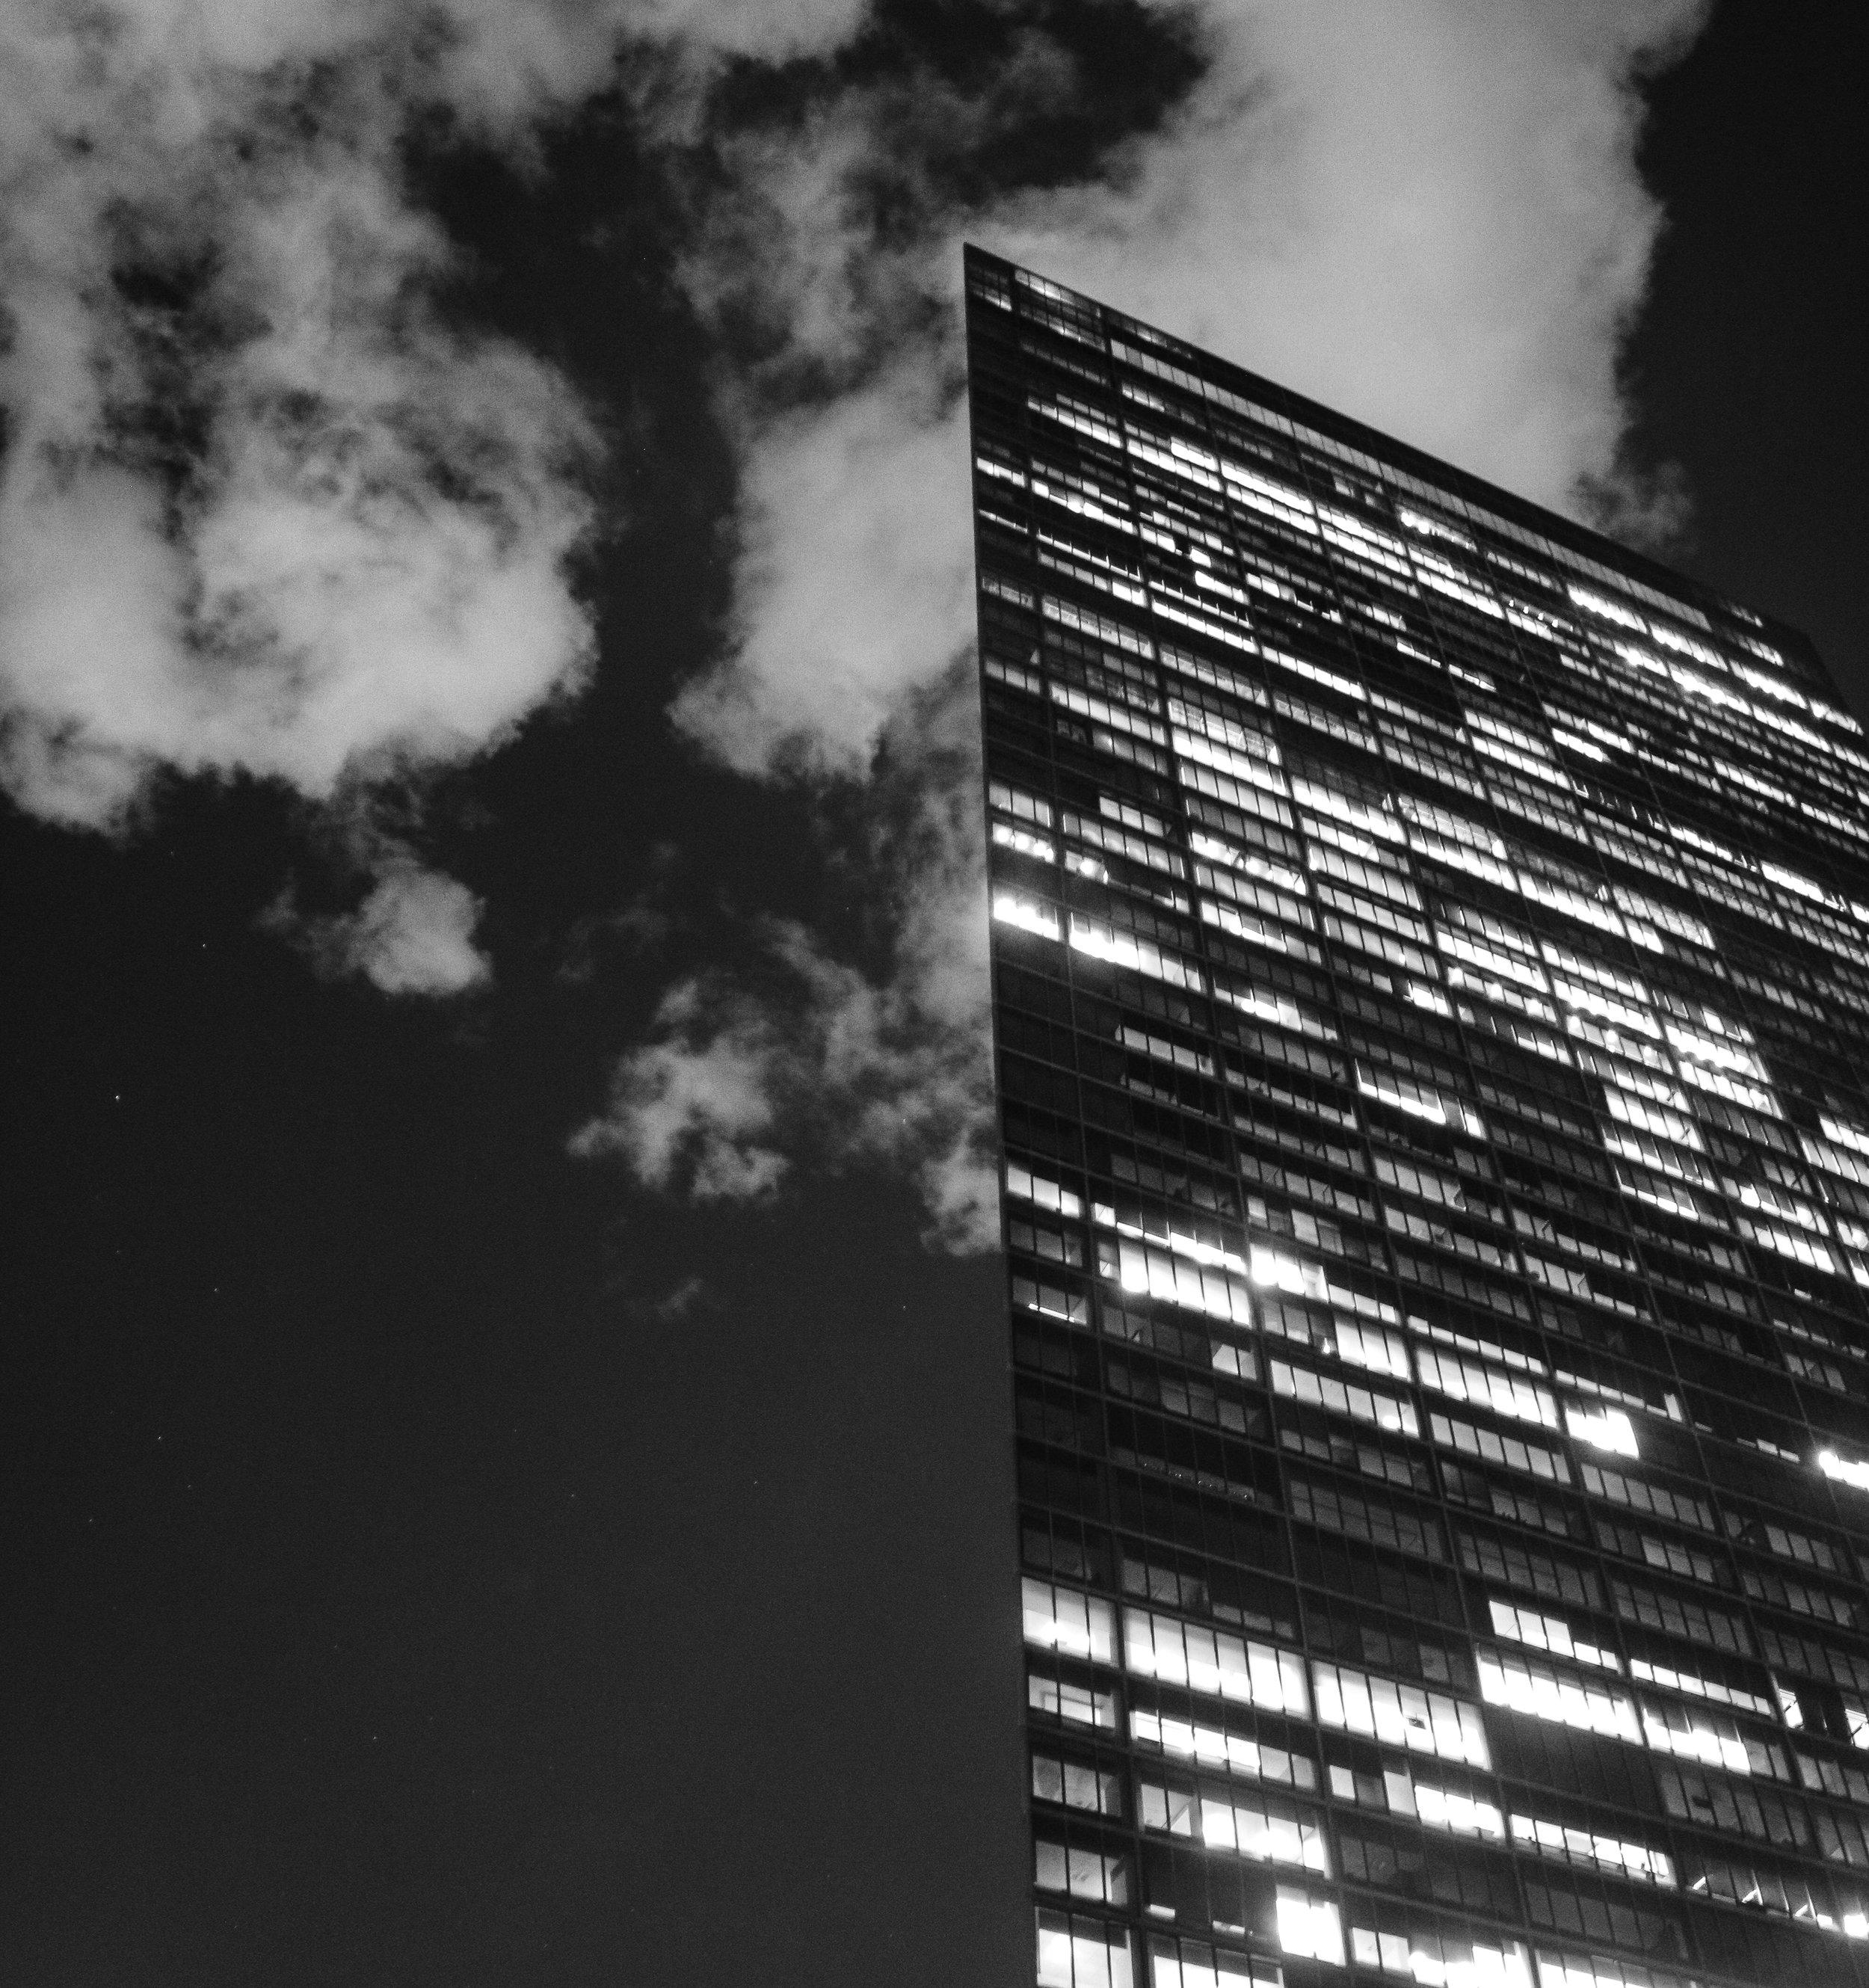 @croppedframe - Boston, MA